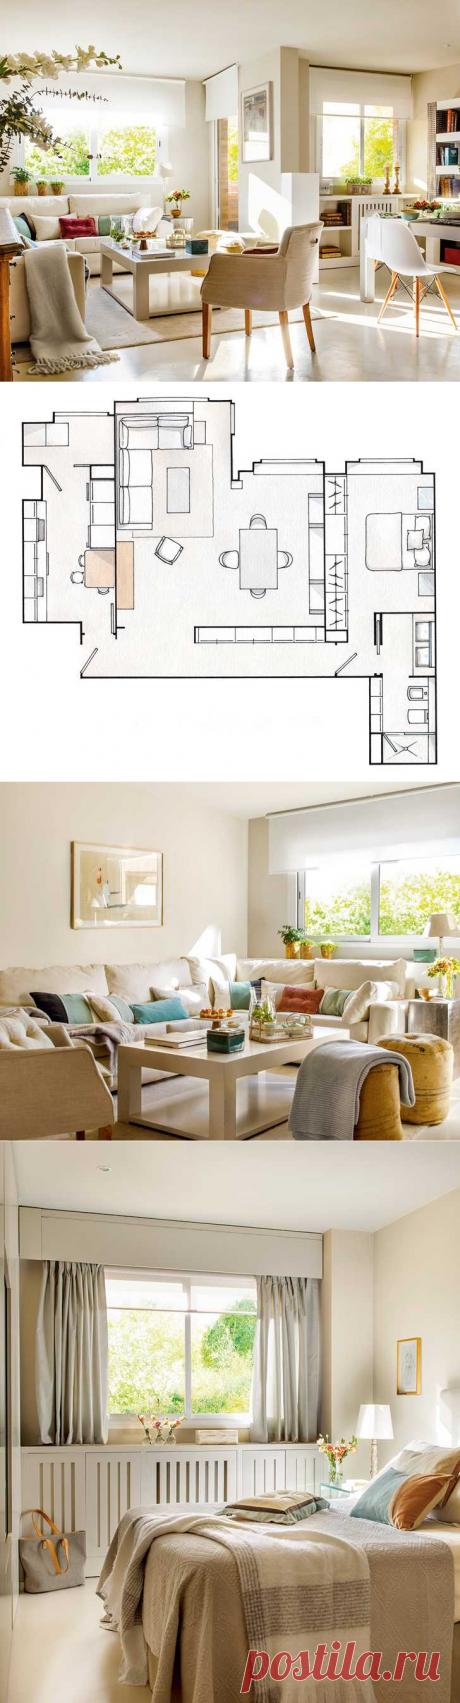 〚 Море тепла и уюта в солнечной испанской квартире (70 кв. м) 〛 ◾ Фото ◾Идеи◾ Дизайн